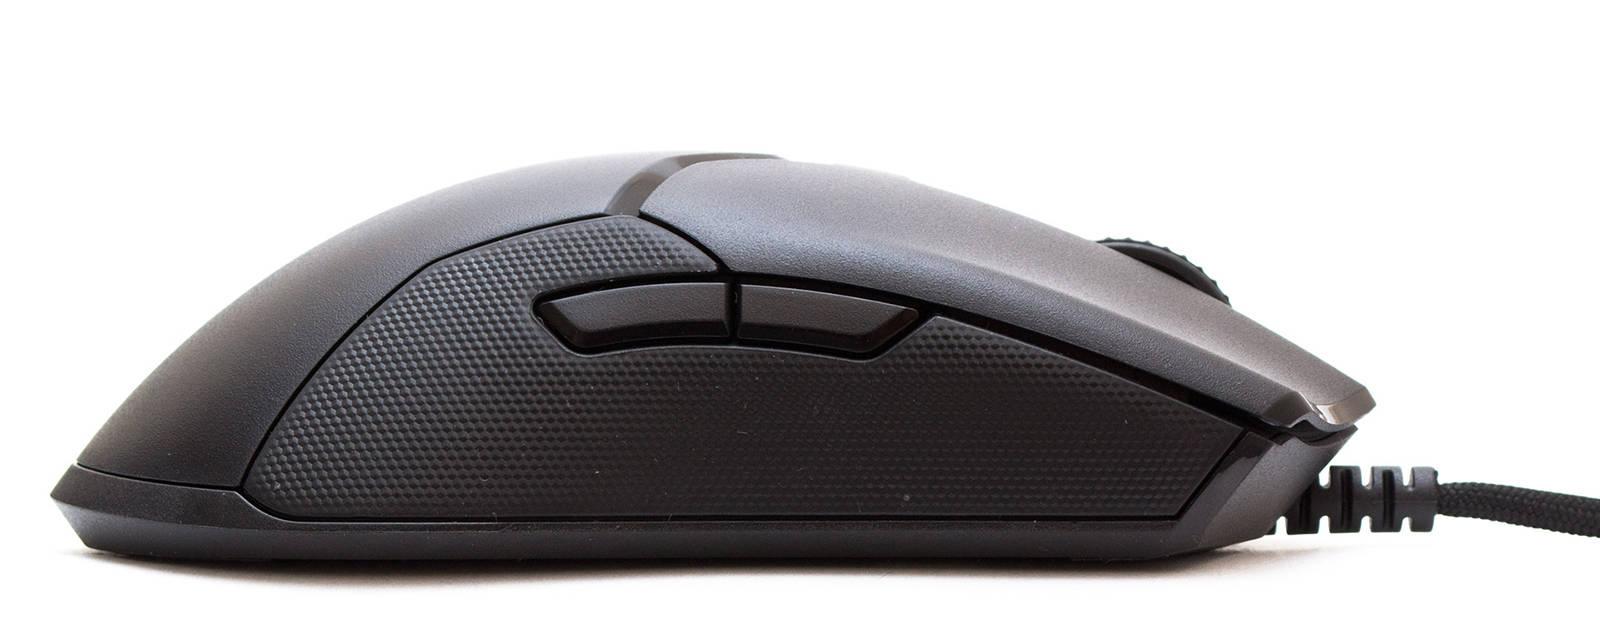 Мышка Razer Viper. Фото 6